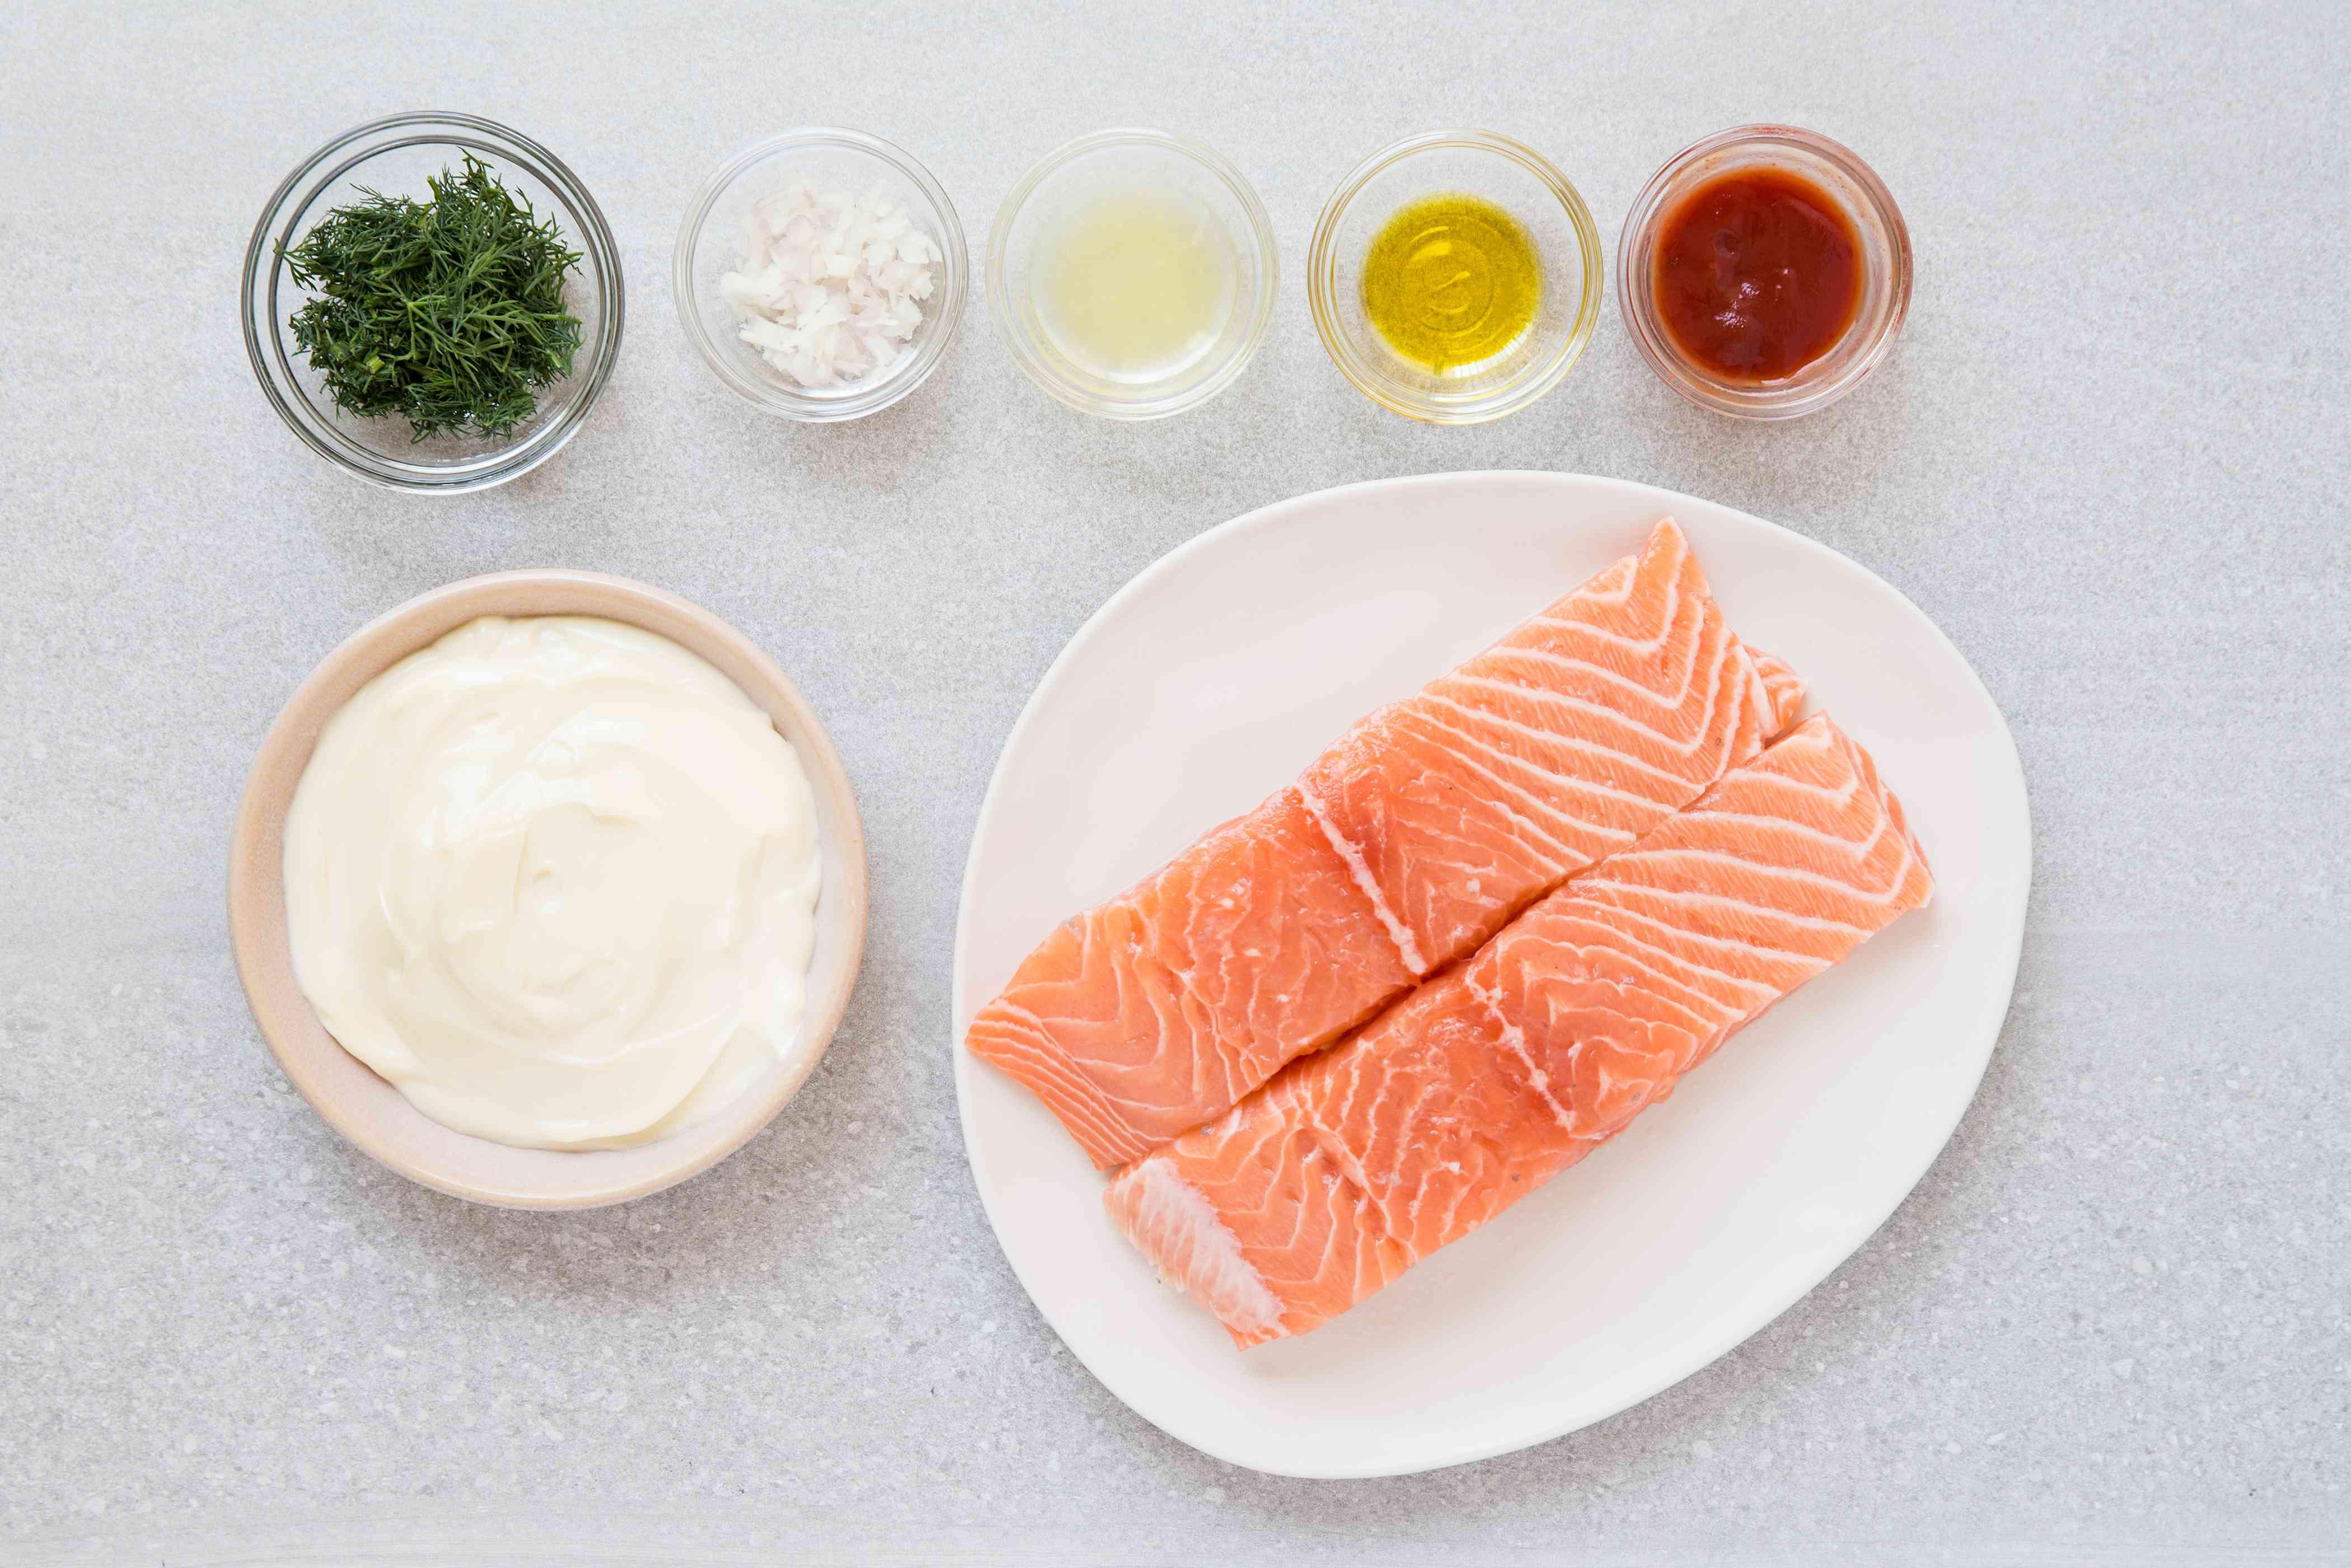 Mayonnaise Grilled Salmon Recipe ingredients